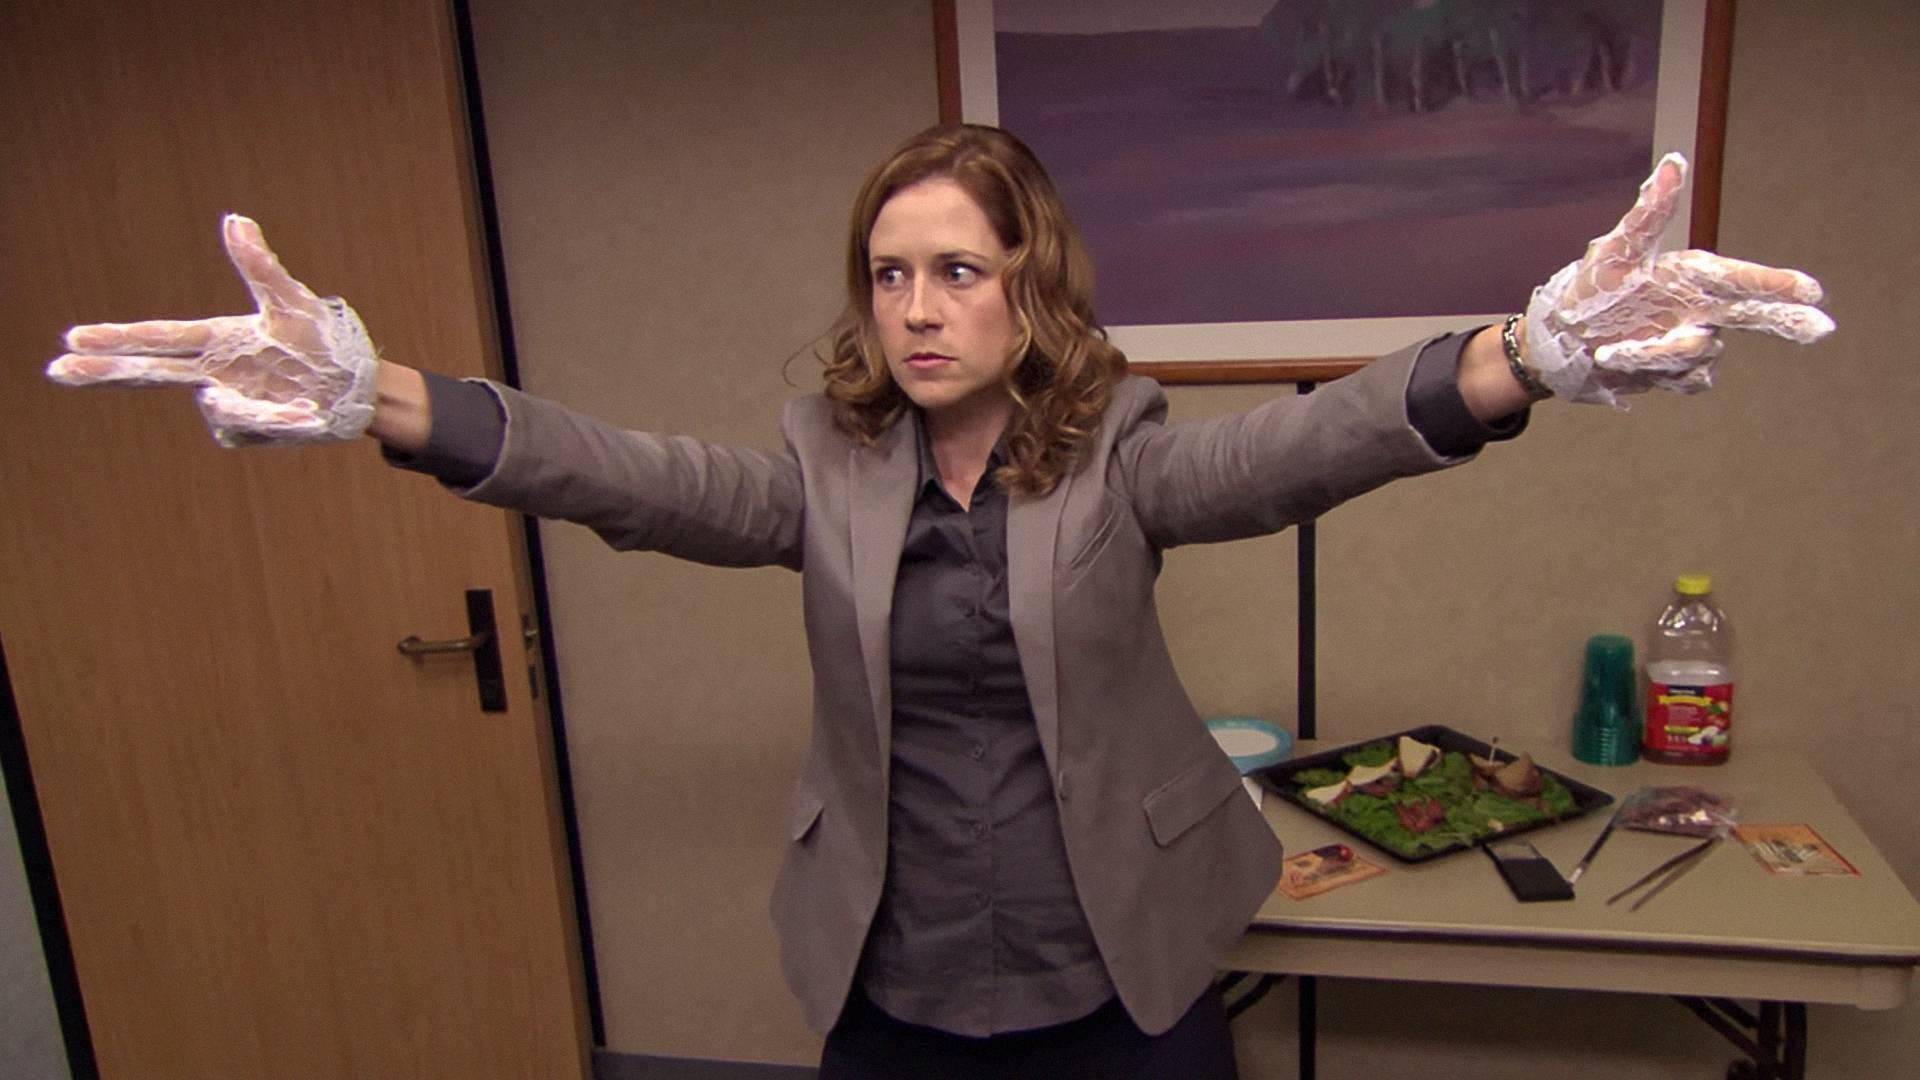 The Office Season 6 Episode 10